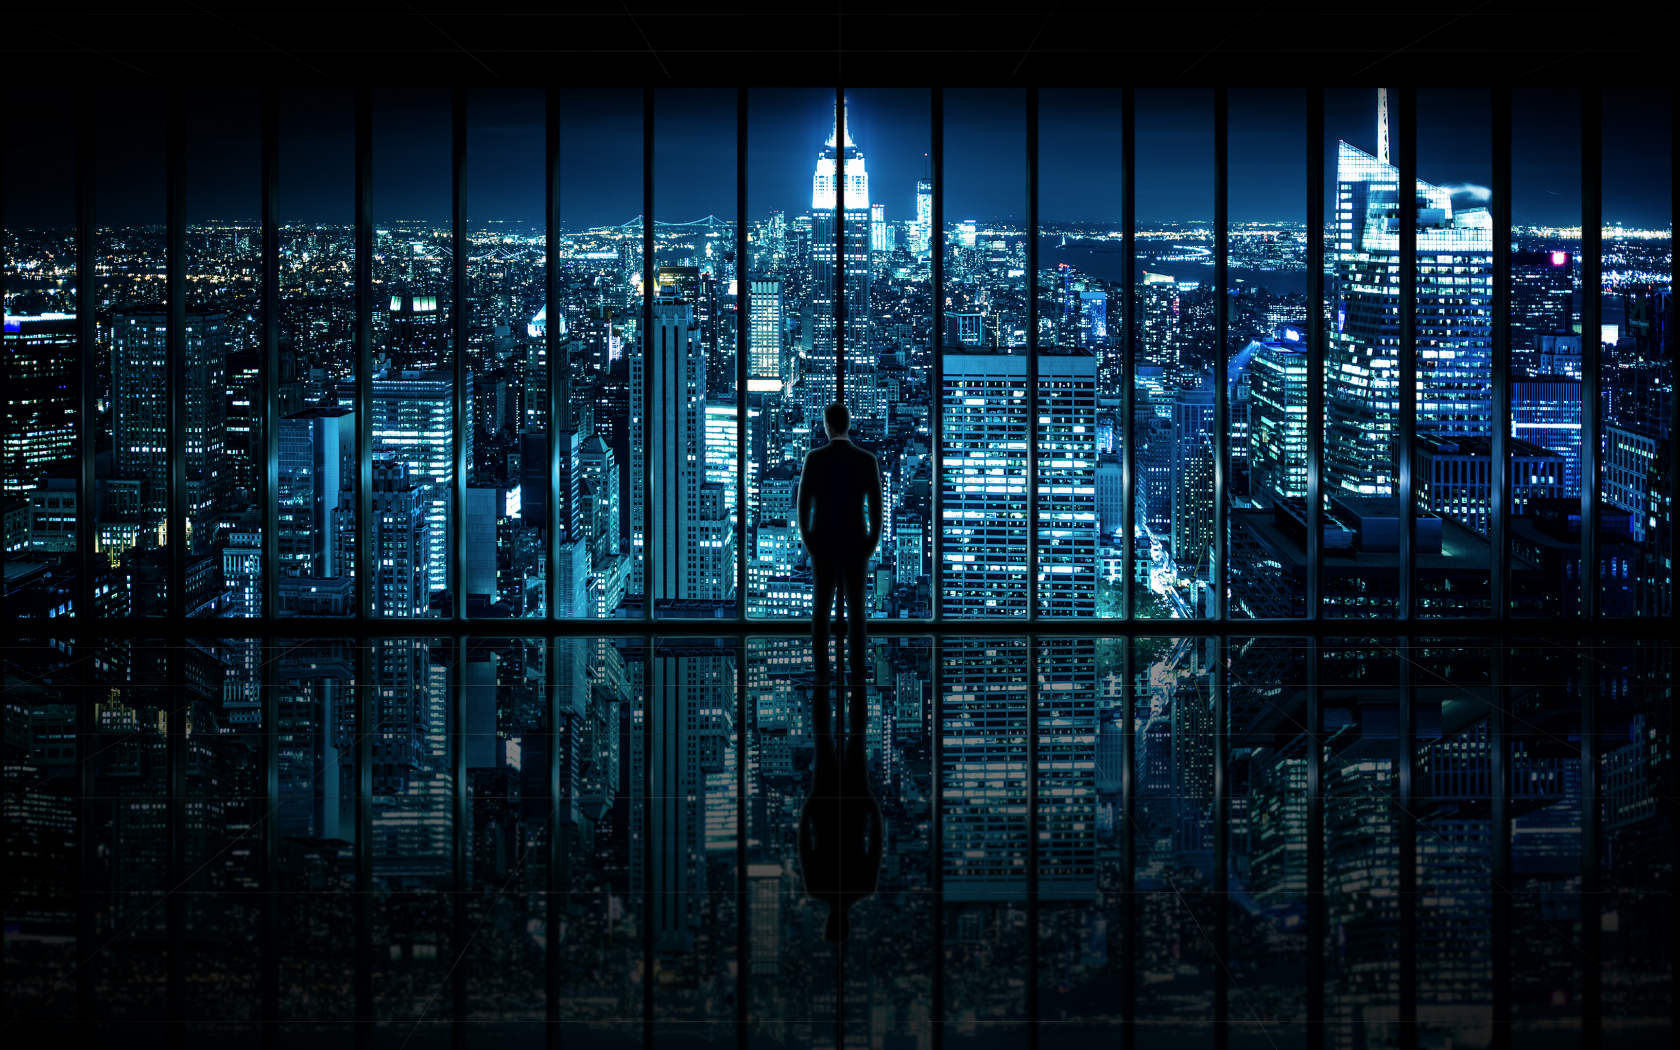 Free Download Windows 10 Gotham City 4k Wallpaper 4k Wallpaper Ultra Hd 4k 3840x2160 For Your Desktop Mobile Tablet Explore 46 Windows 10 City Wallpaper Windows 10 Wallpapers Free